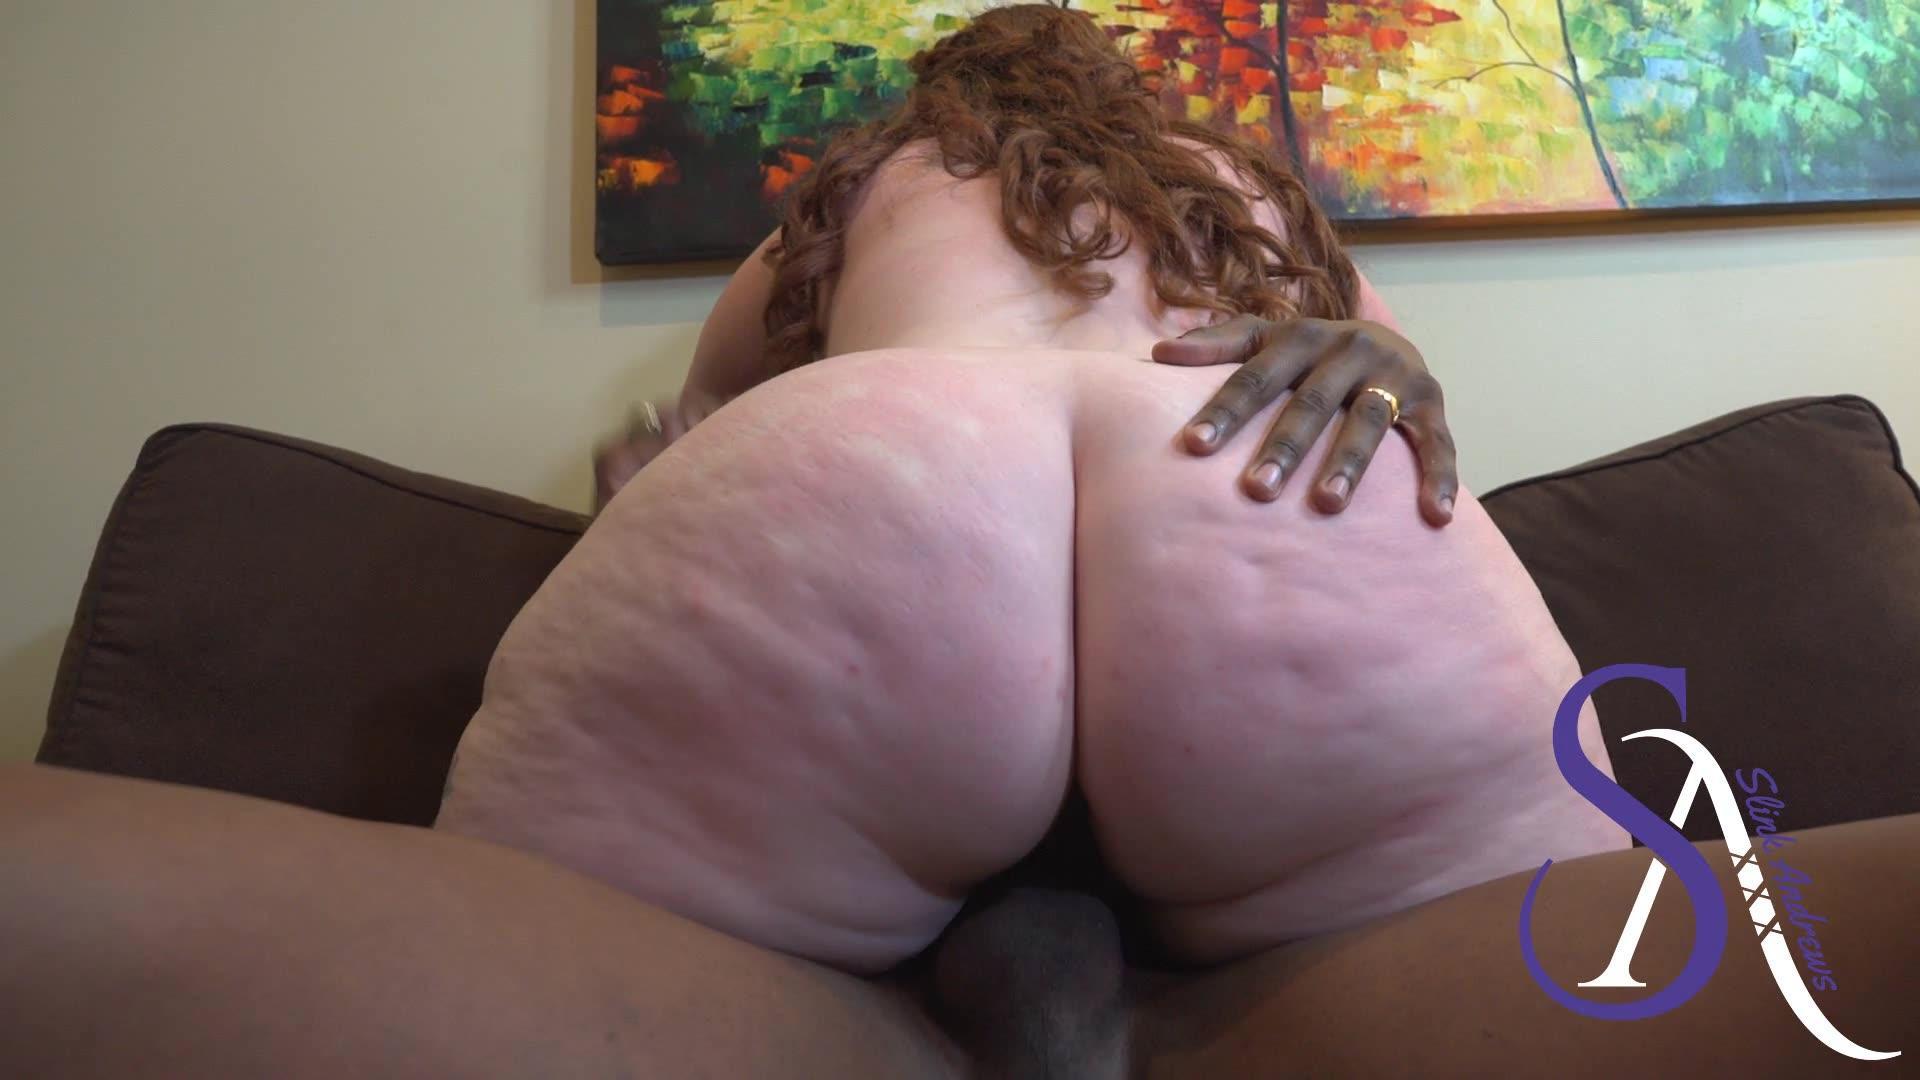 Free bare feet porn pics